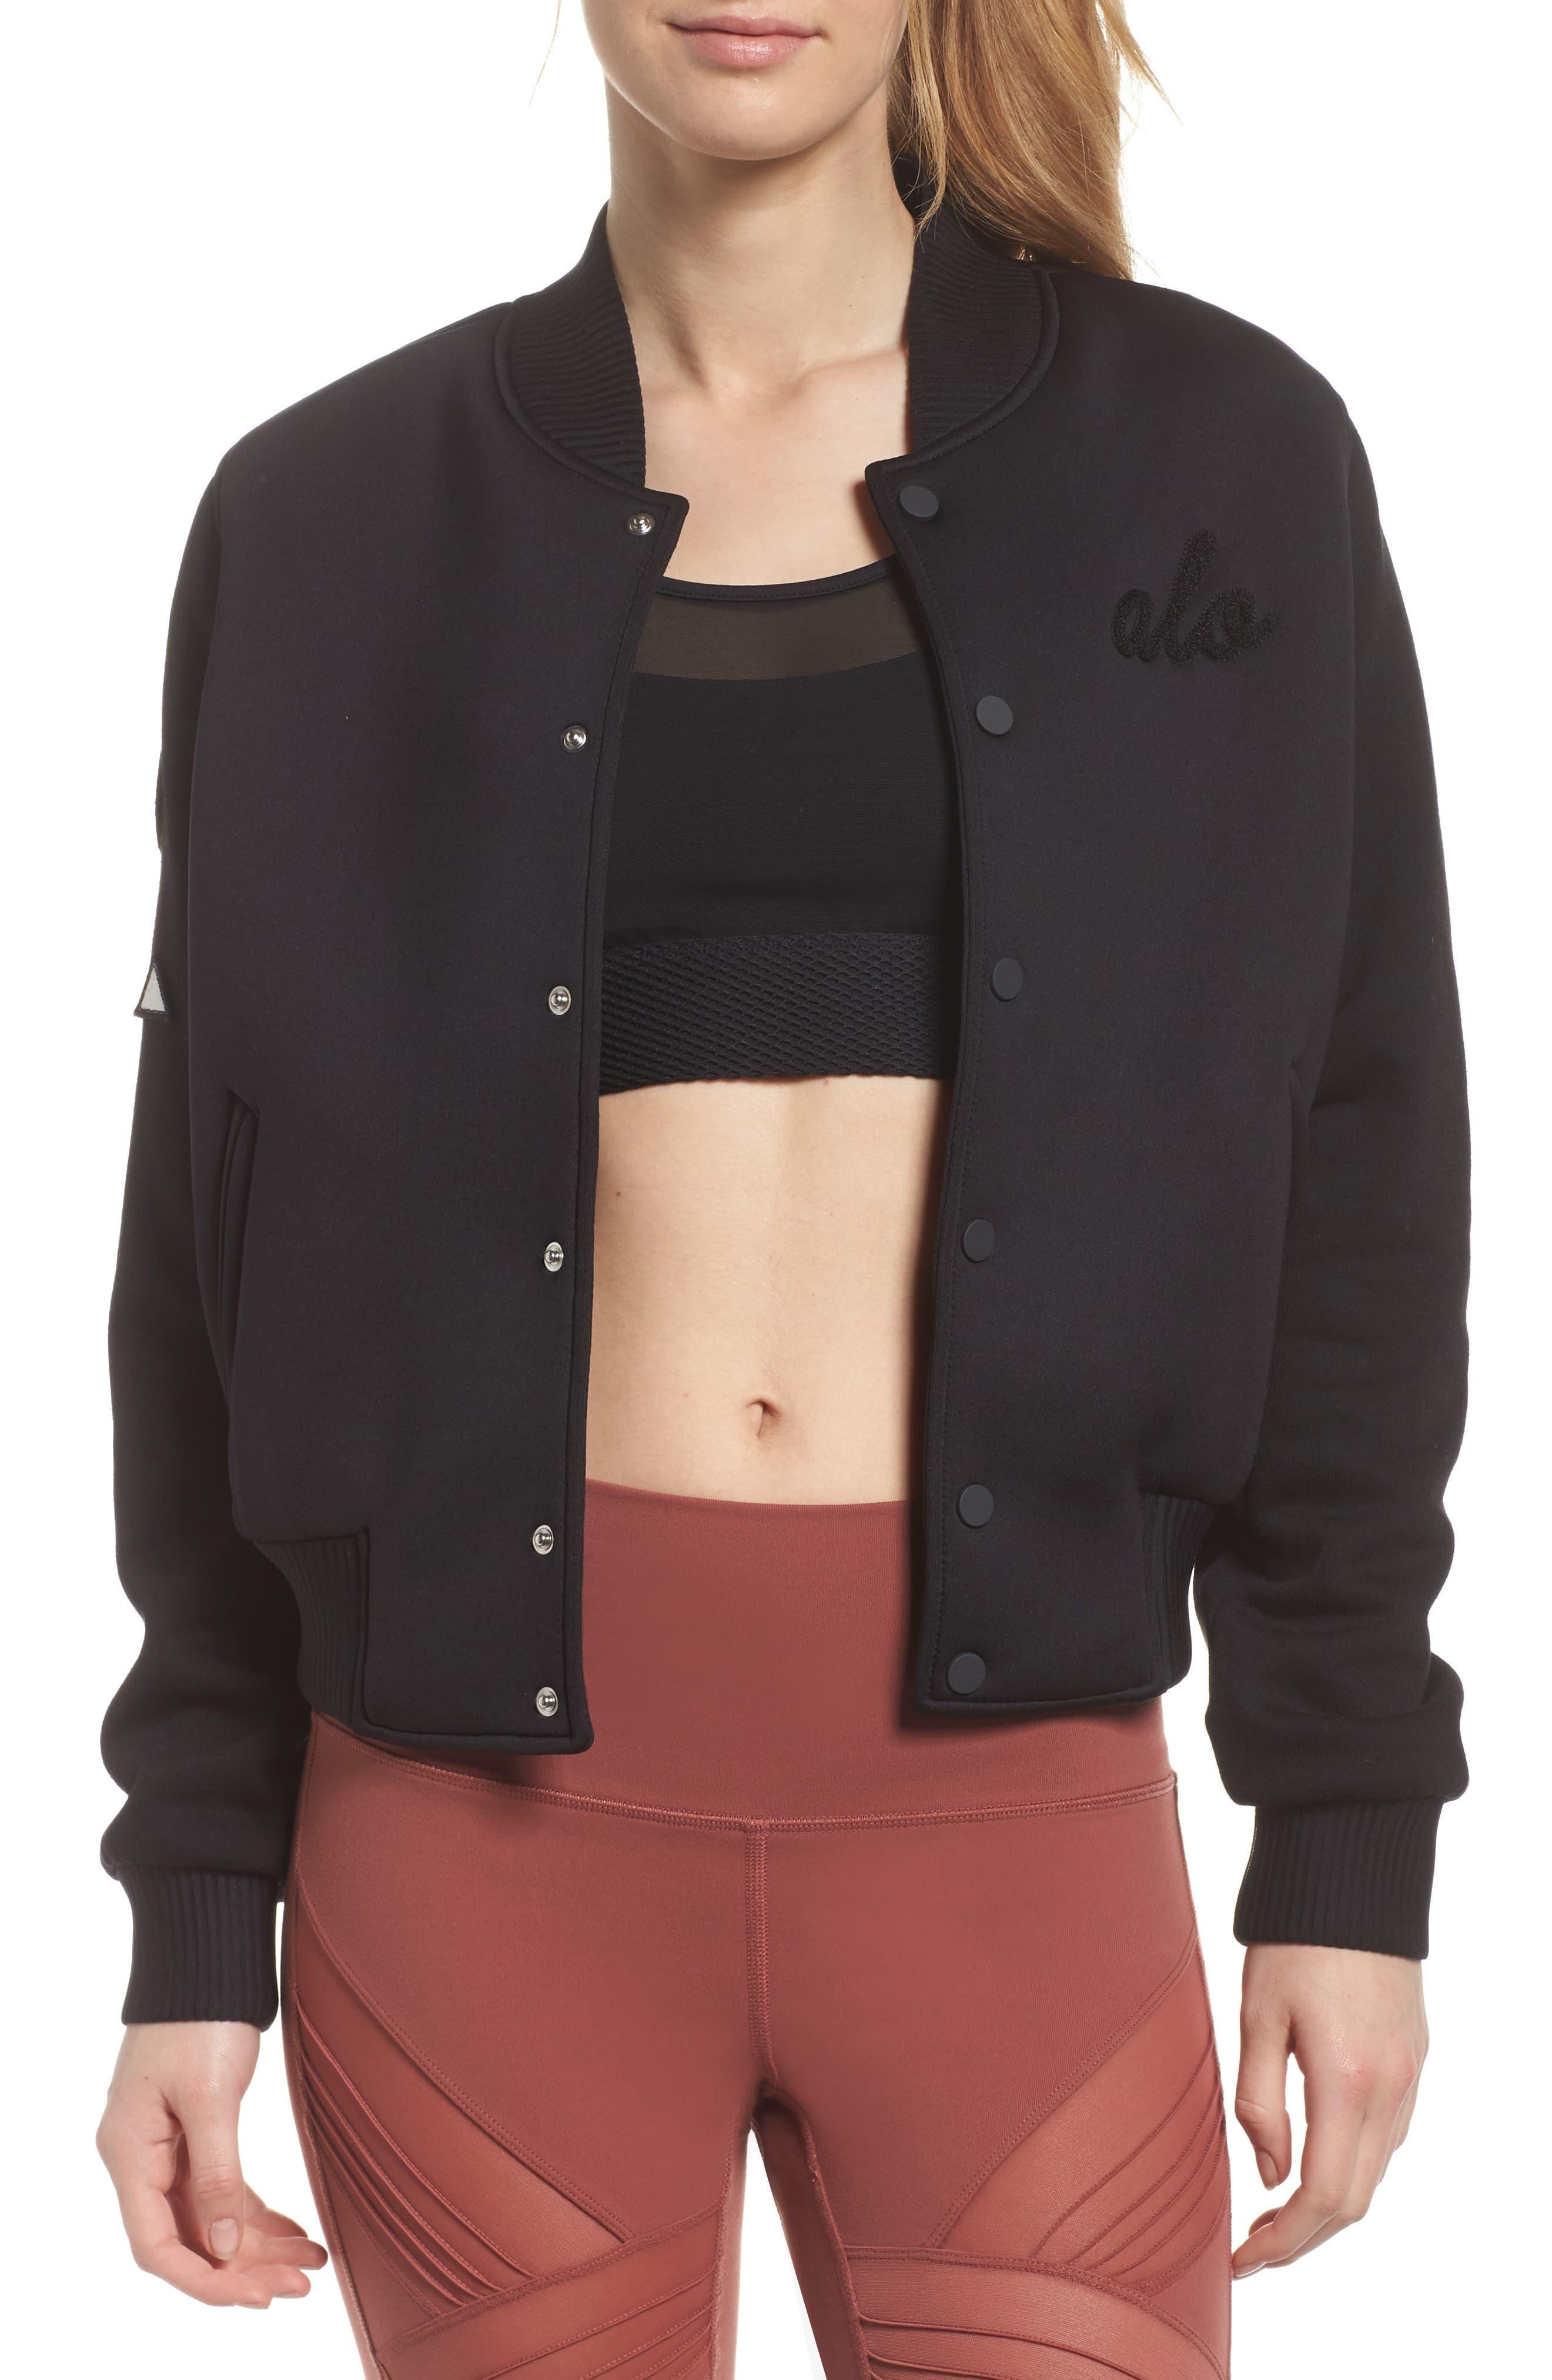 League Varsity Jacket,                             Main thumbnail 1, color,                             Black/ Alo Patches